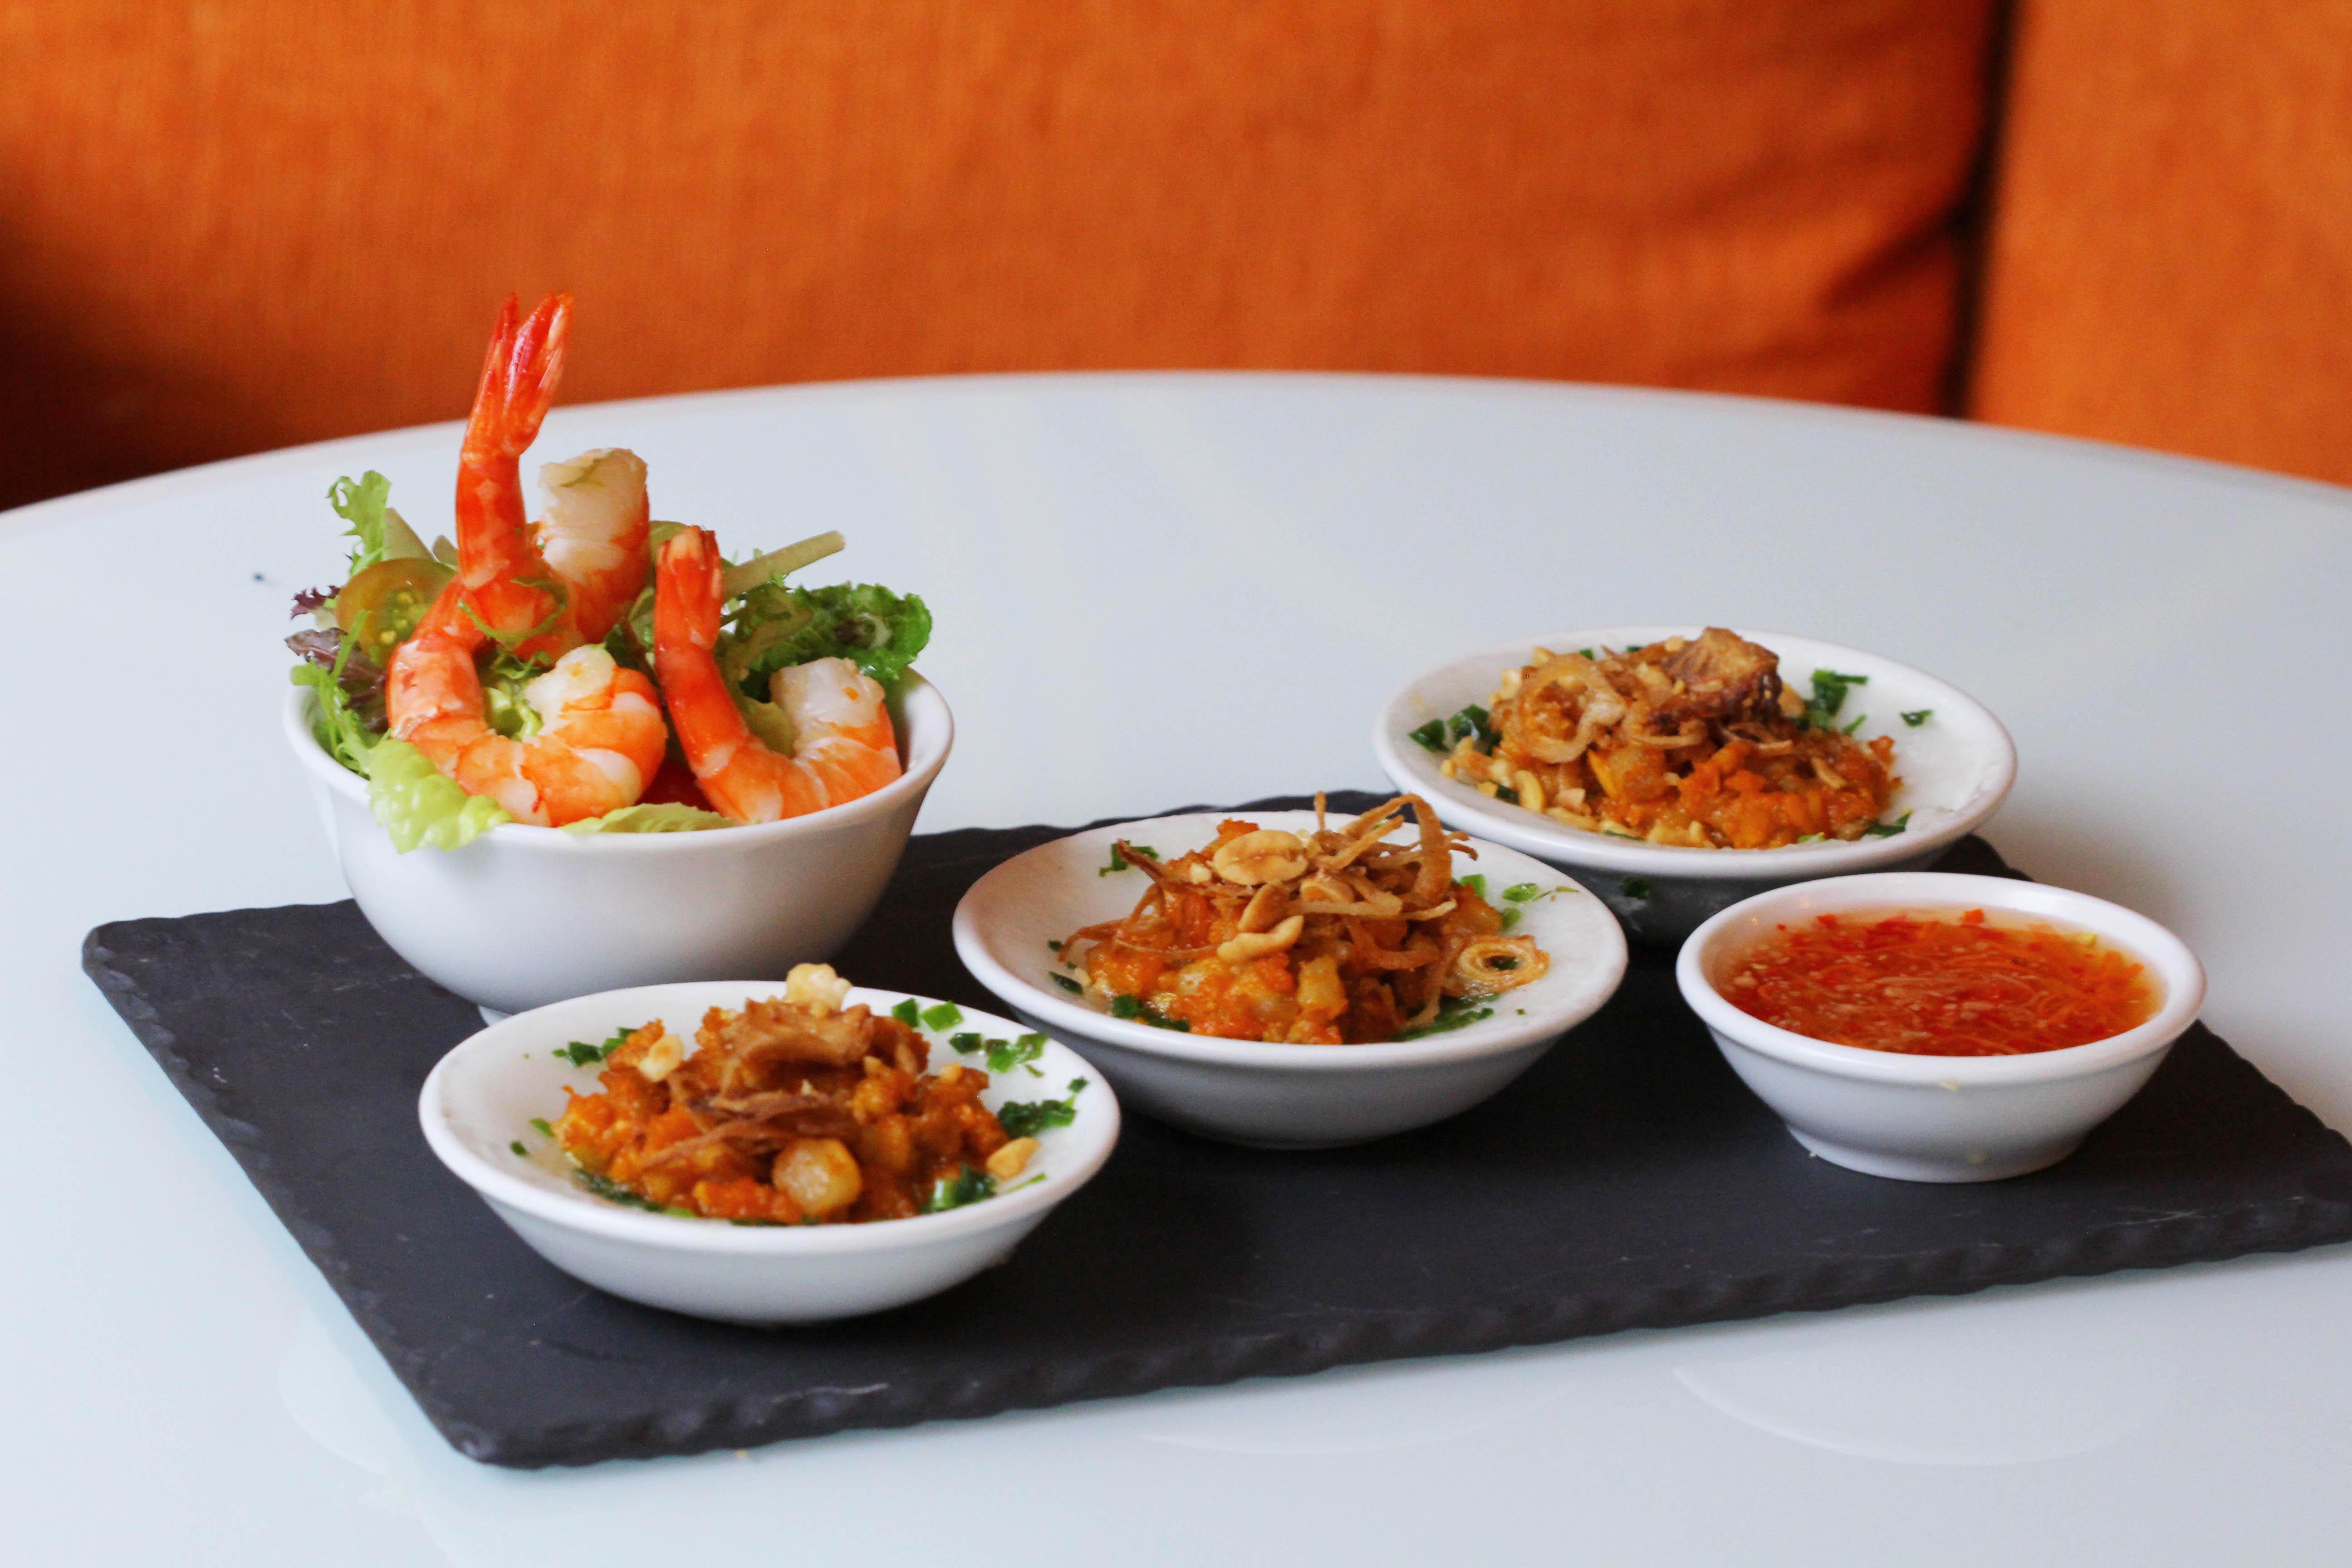 Sheraton Saigon - ẩm thực Tết sepecial menu - elle vietnam 10